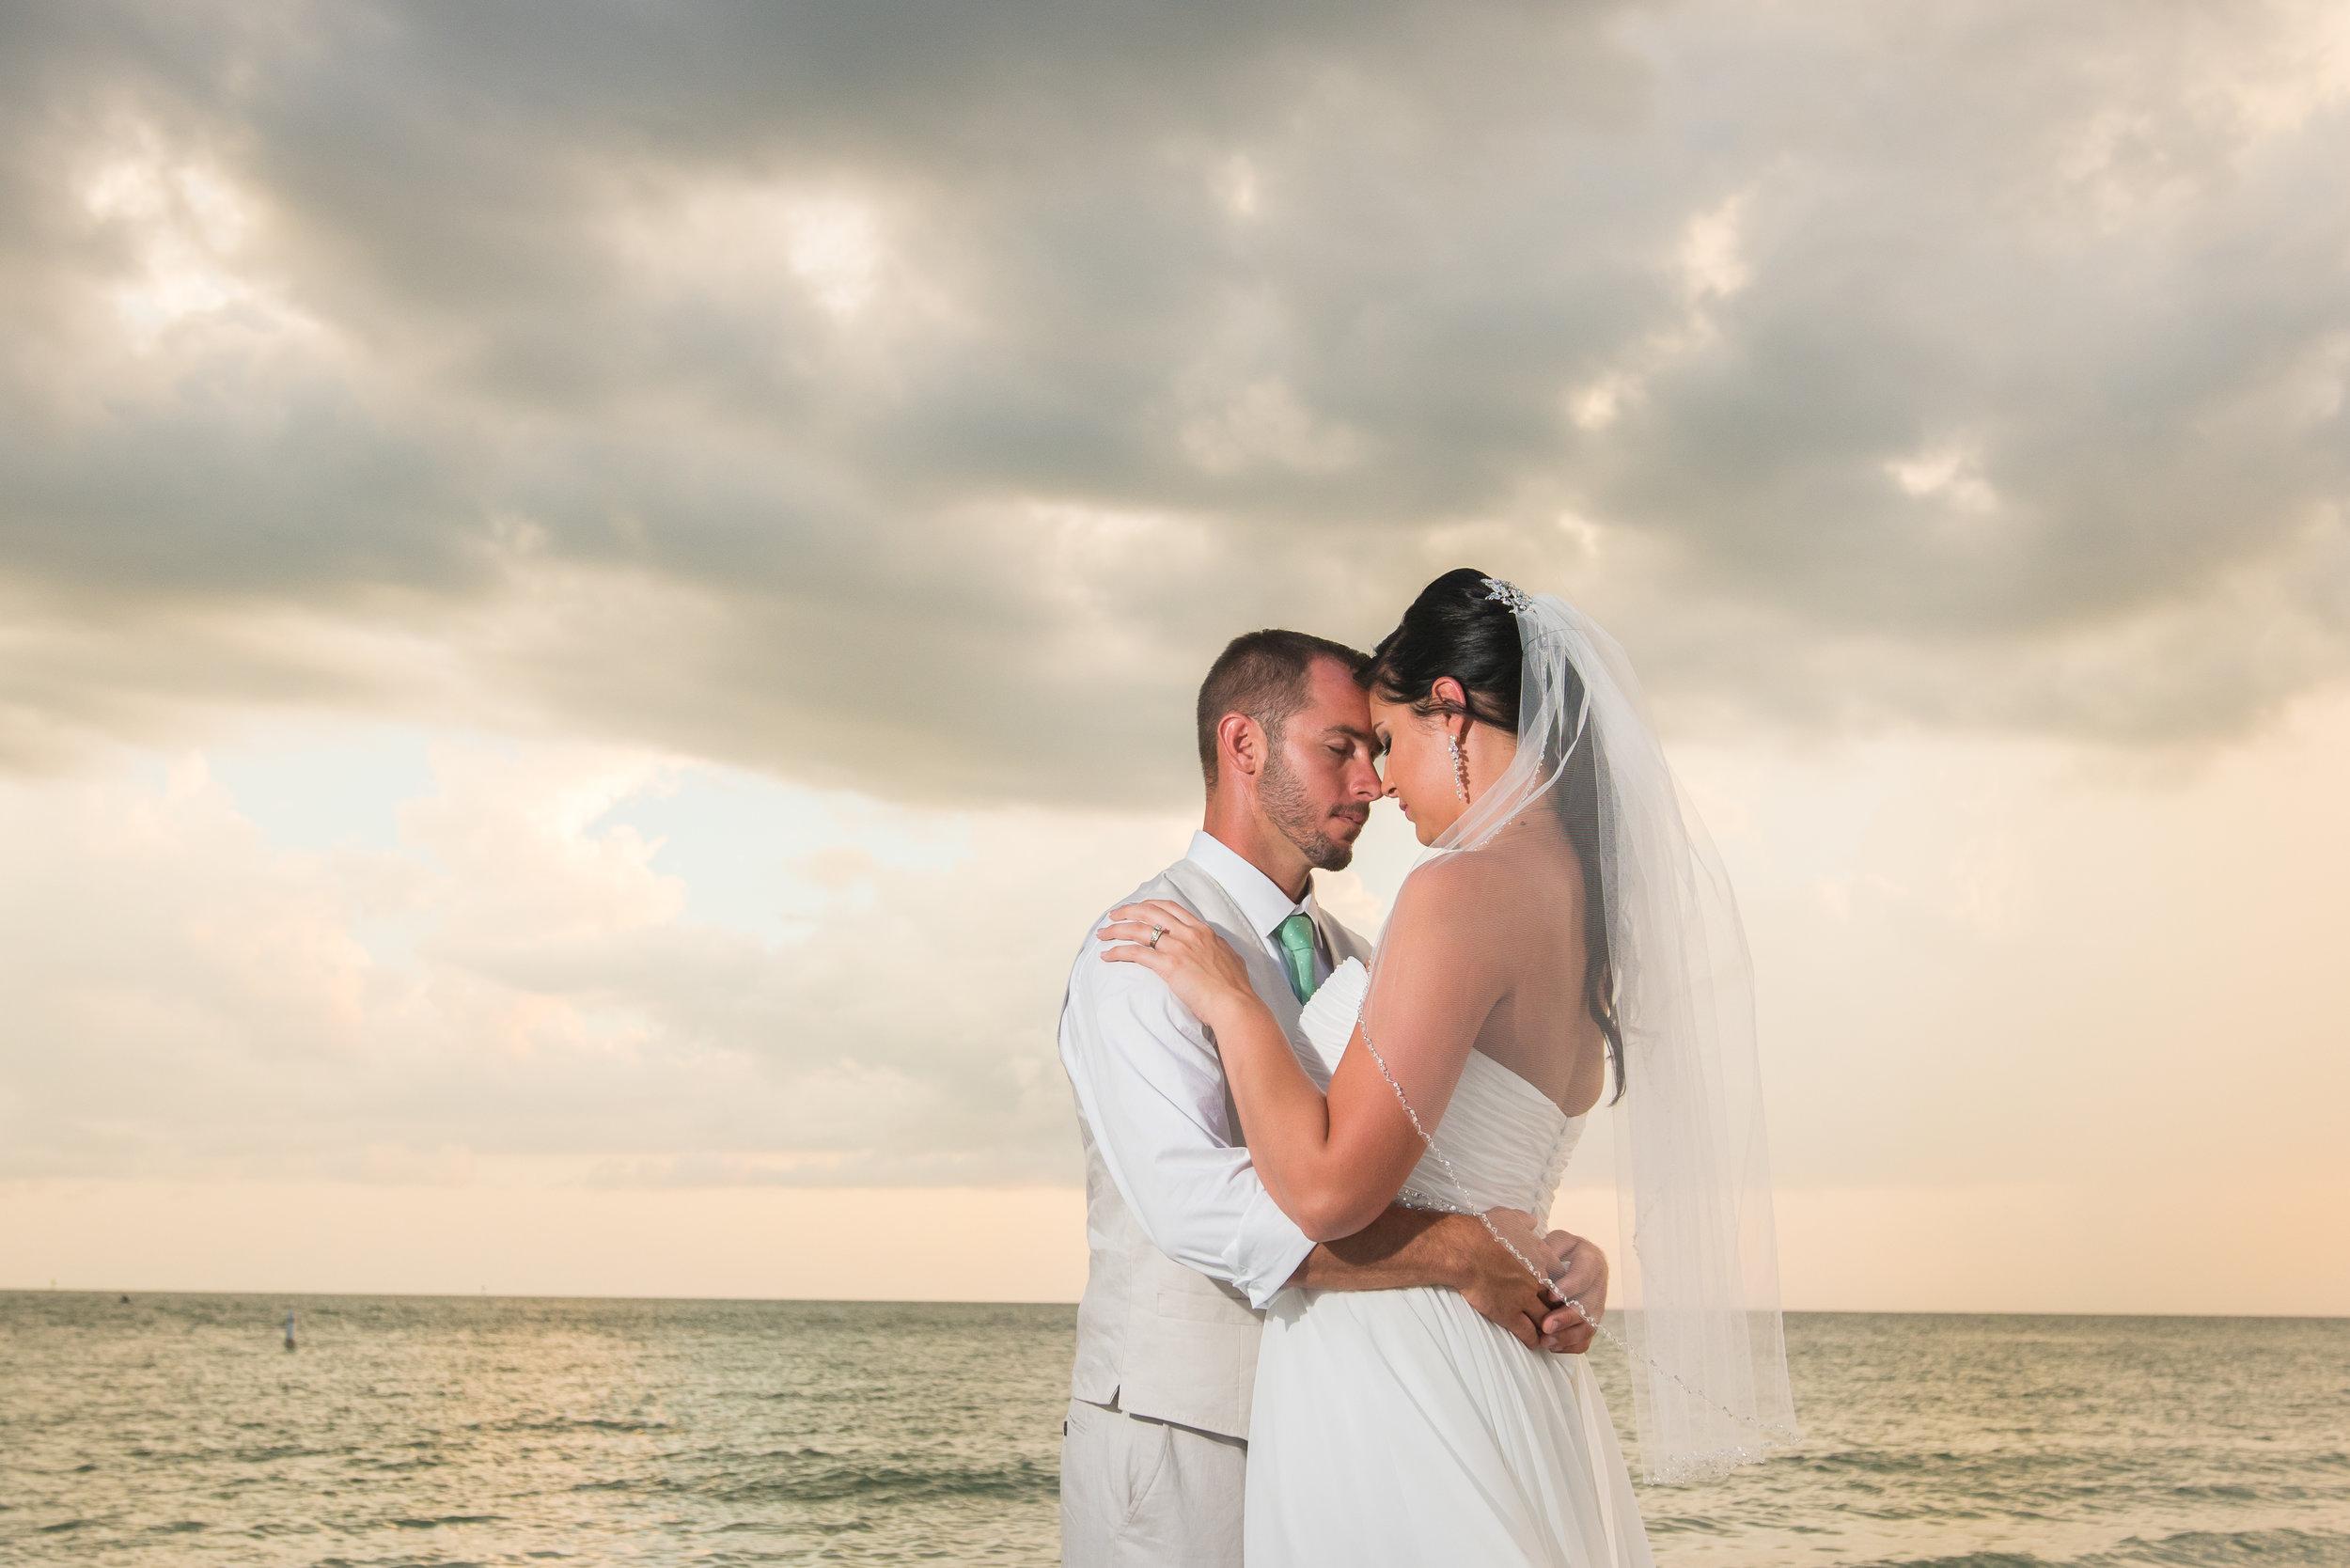 St.Pete wedding, St.Pete wedding photographer, Tampa wedding photographer, Tampa photographer, Mir Salgado Photography